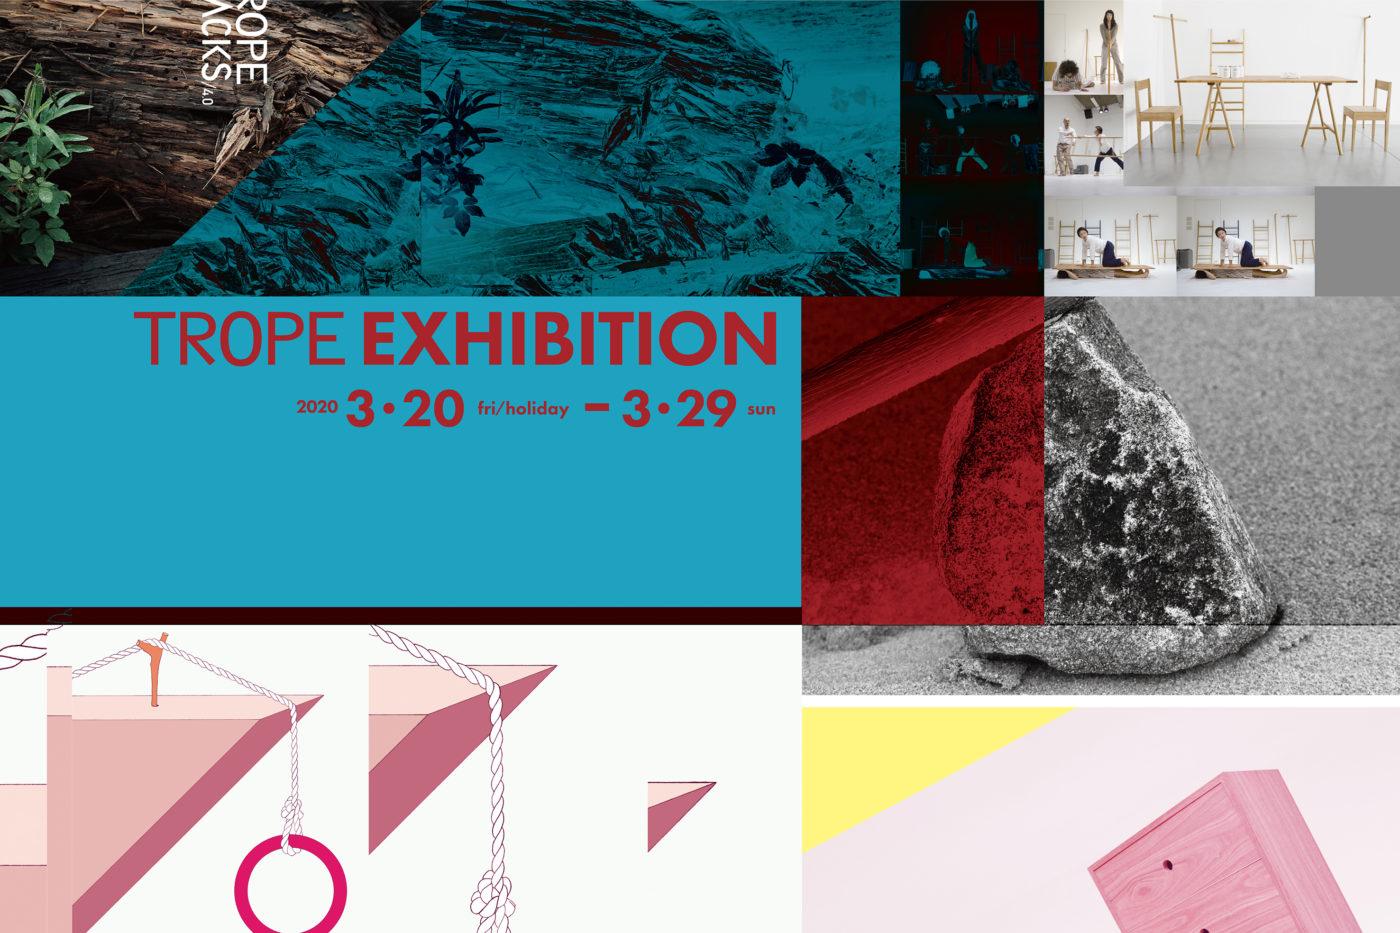 grafオリジナルプロダクト「TROPE」と、異なる専門家との実験プロジェクト「TROPE HACK」の展示企画を開催